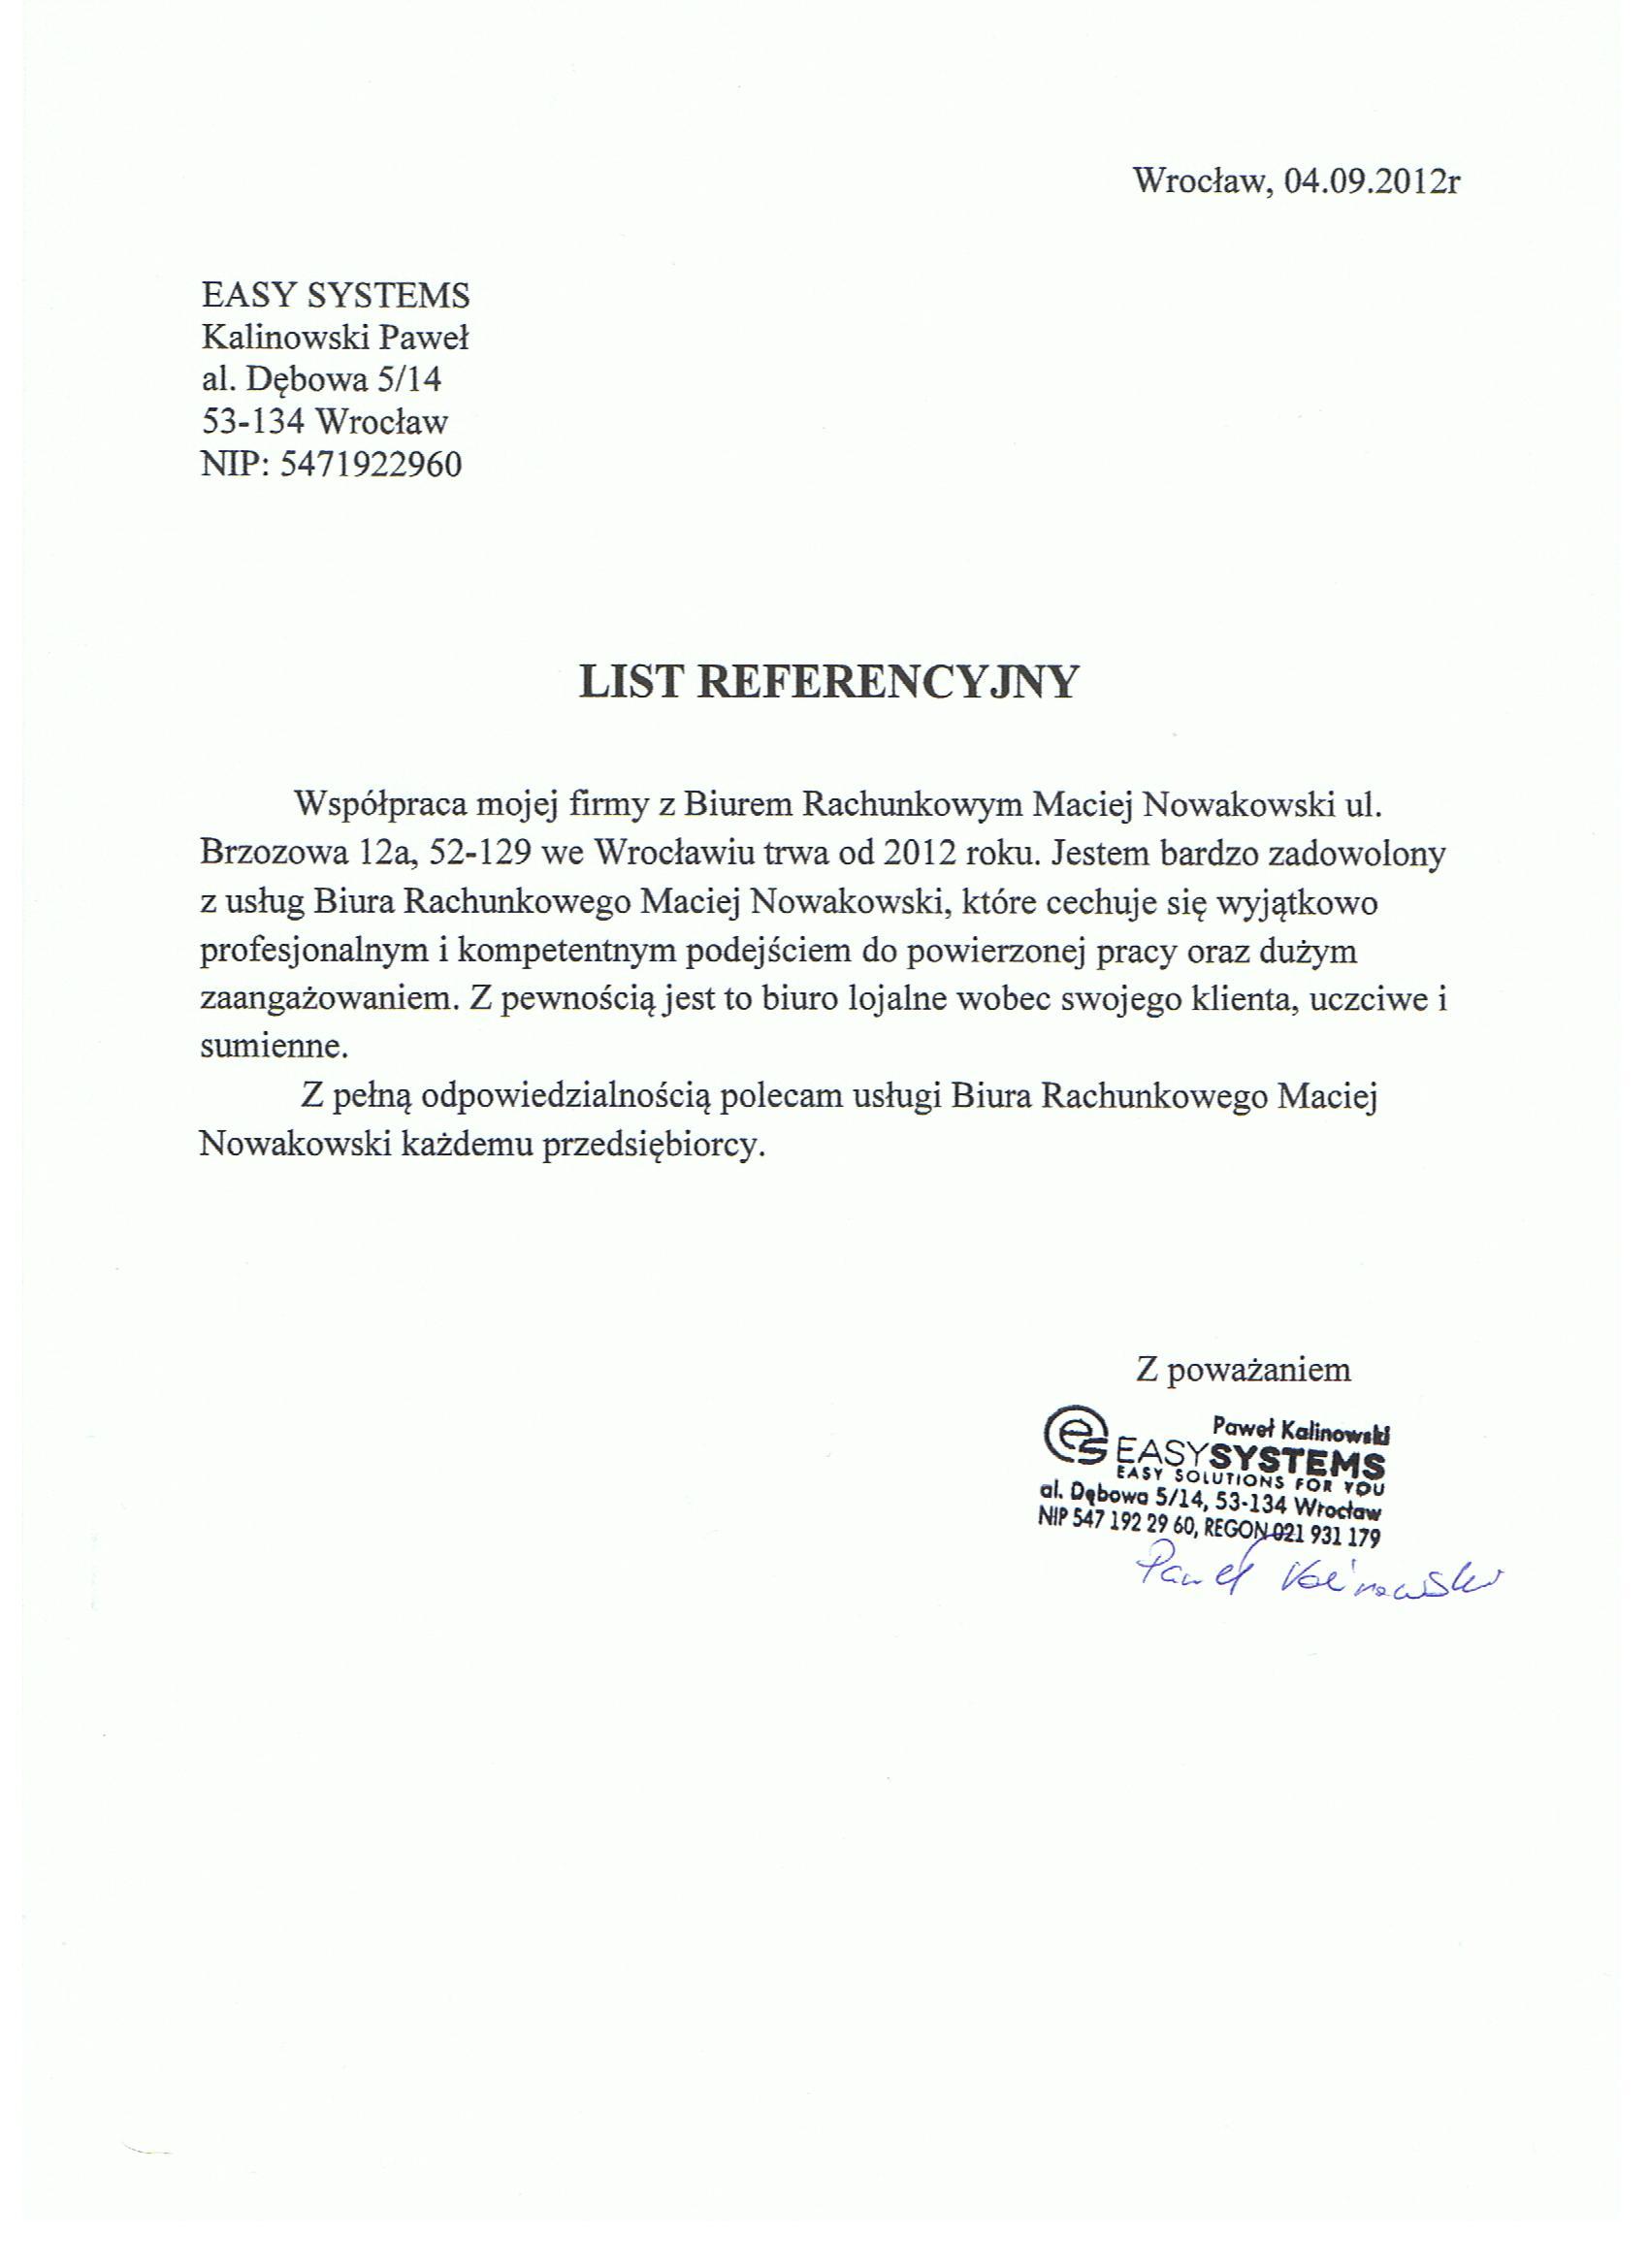 REFERENCJE_KALINOWSKI